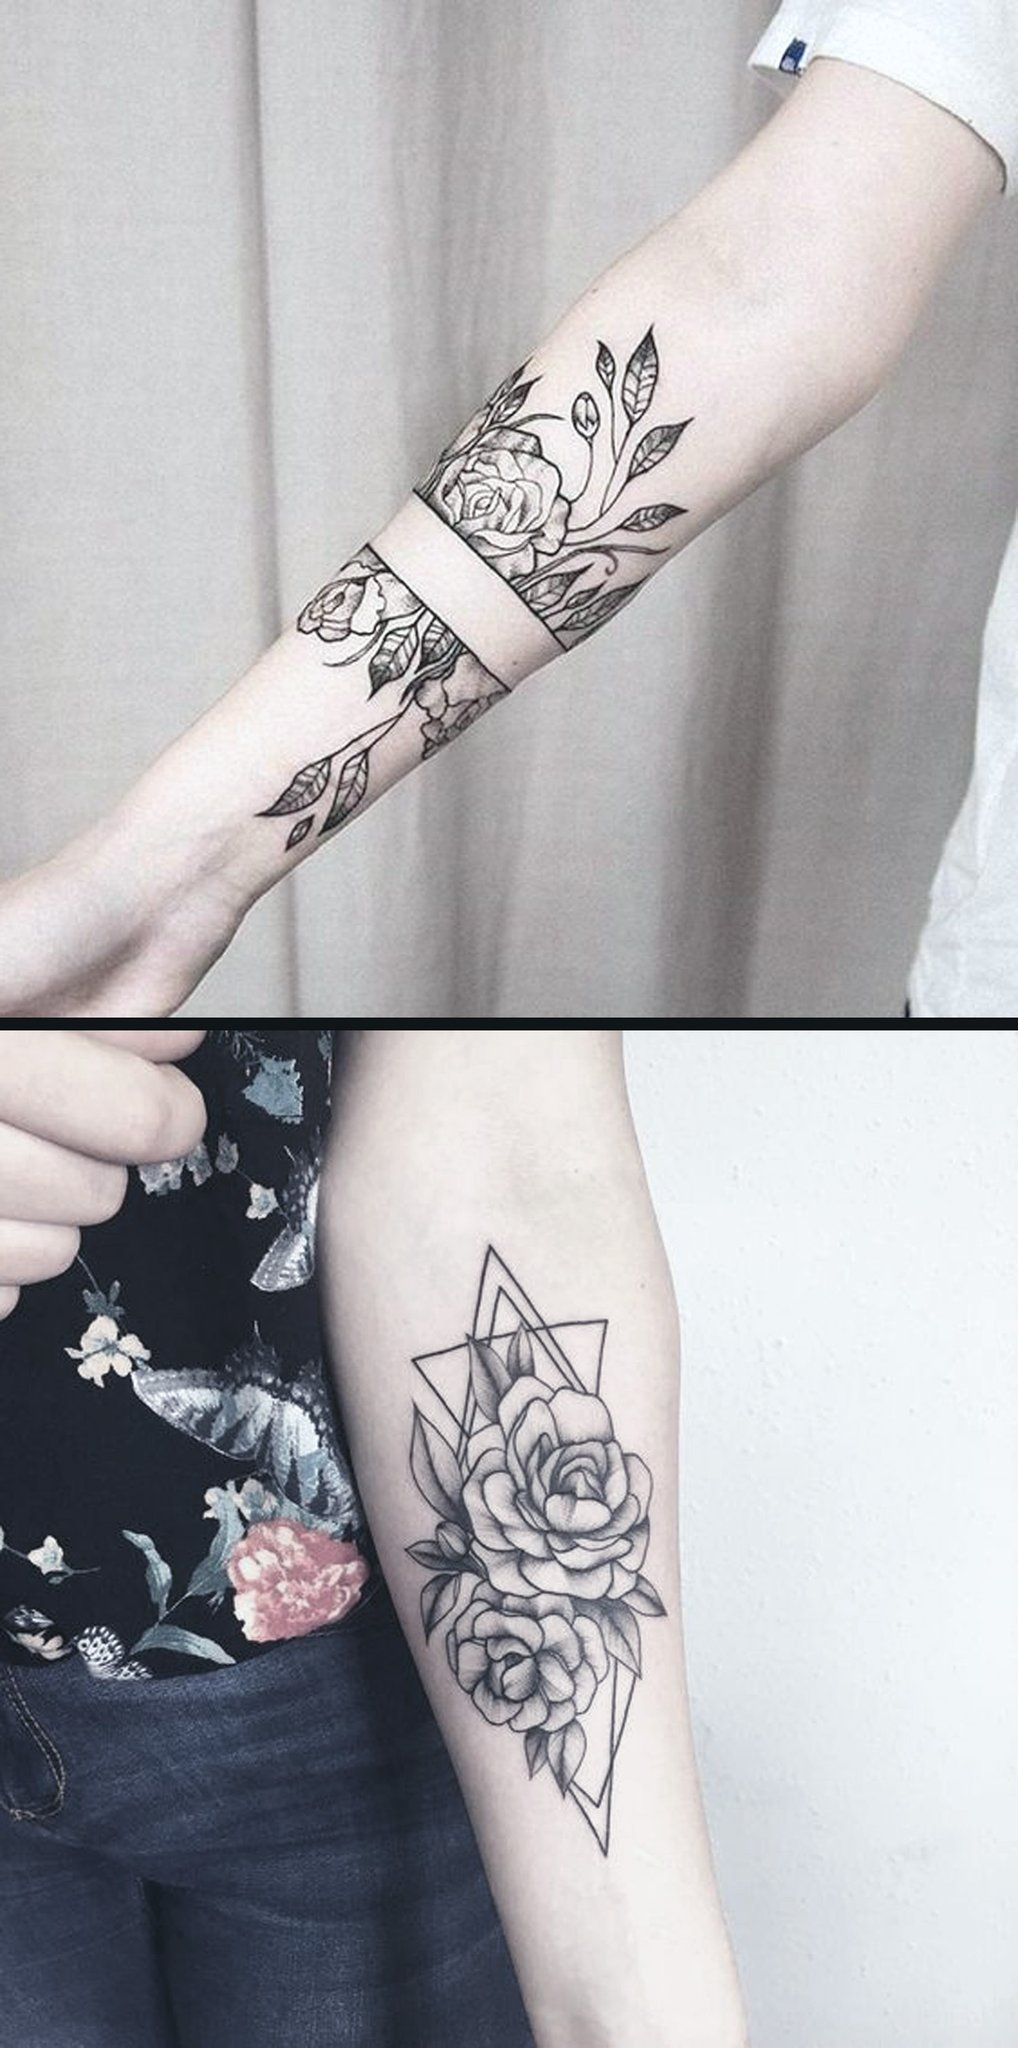 Geometric Diamond Rose Forearm Tattoo Ideas For Women Black Wild